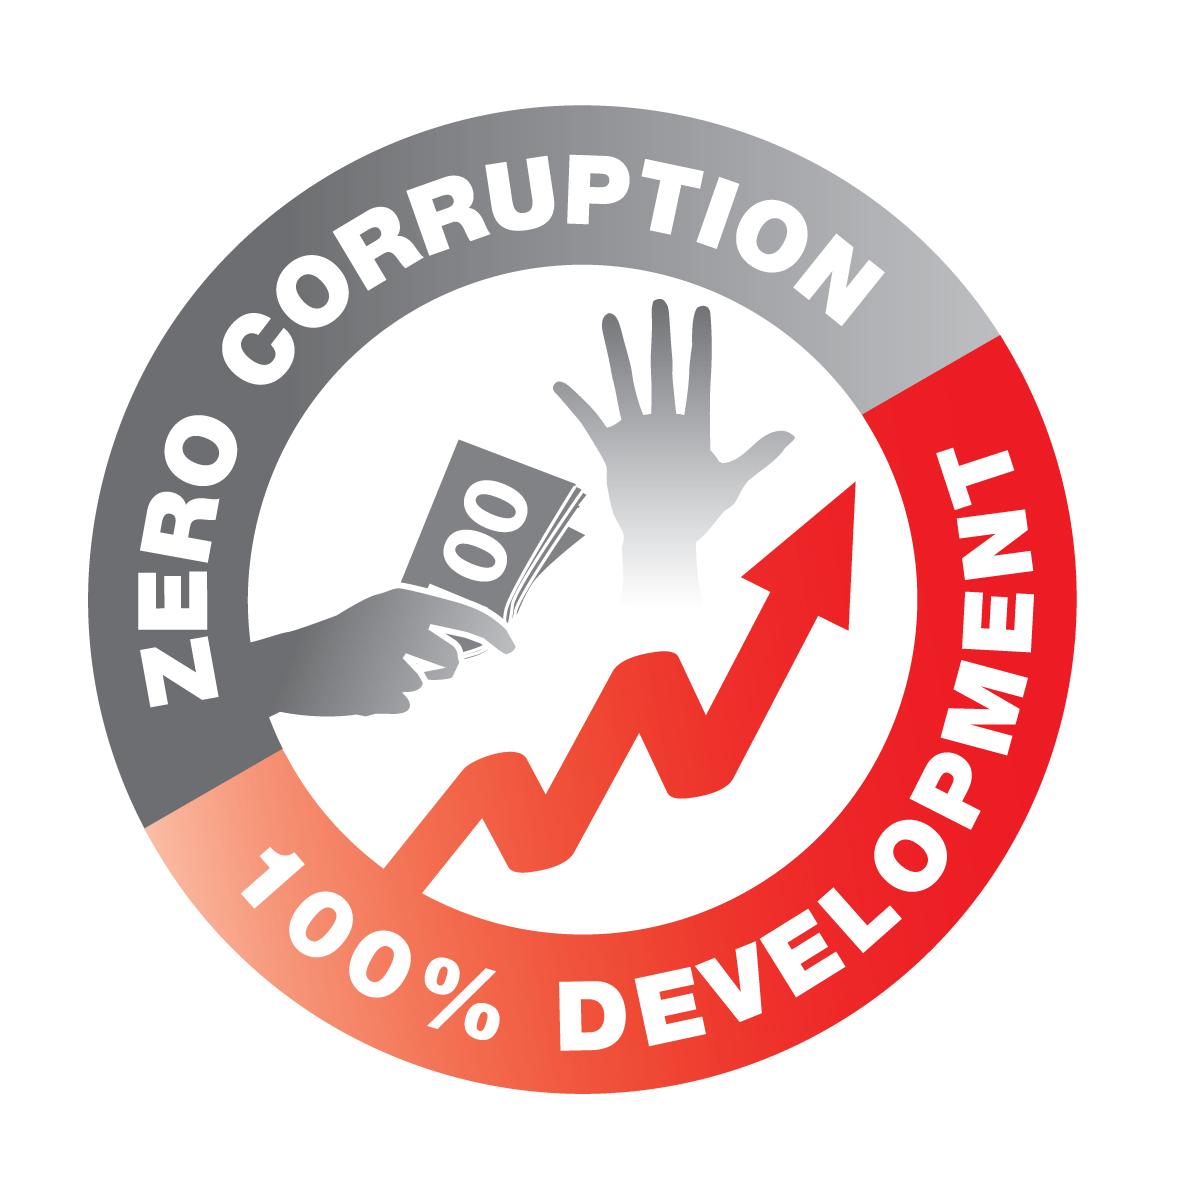 Anti Corruption Images anti-corruption competition